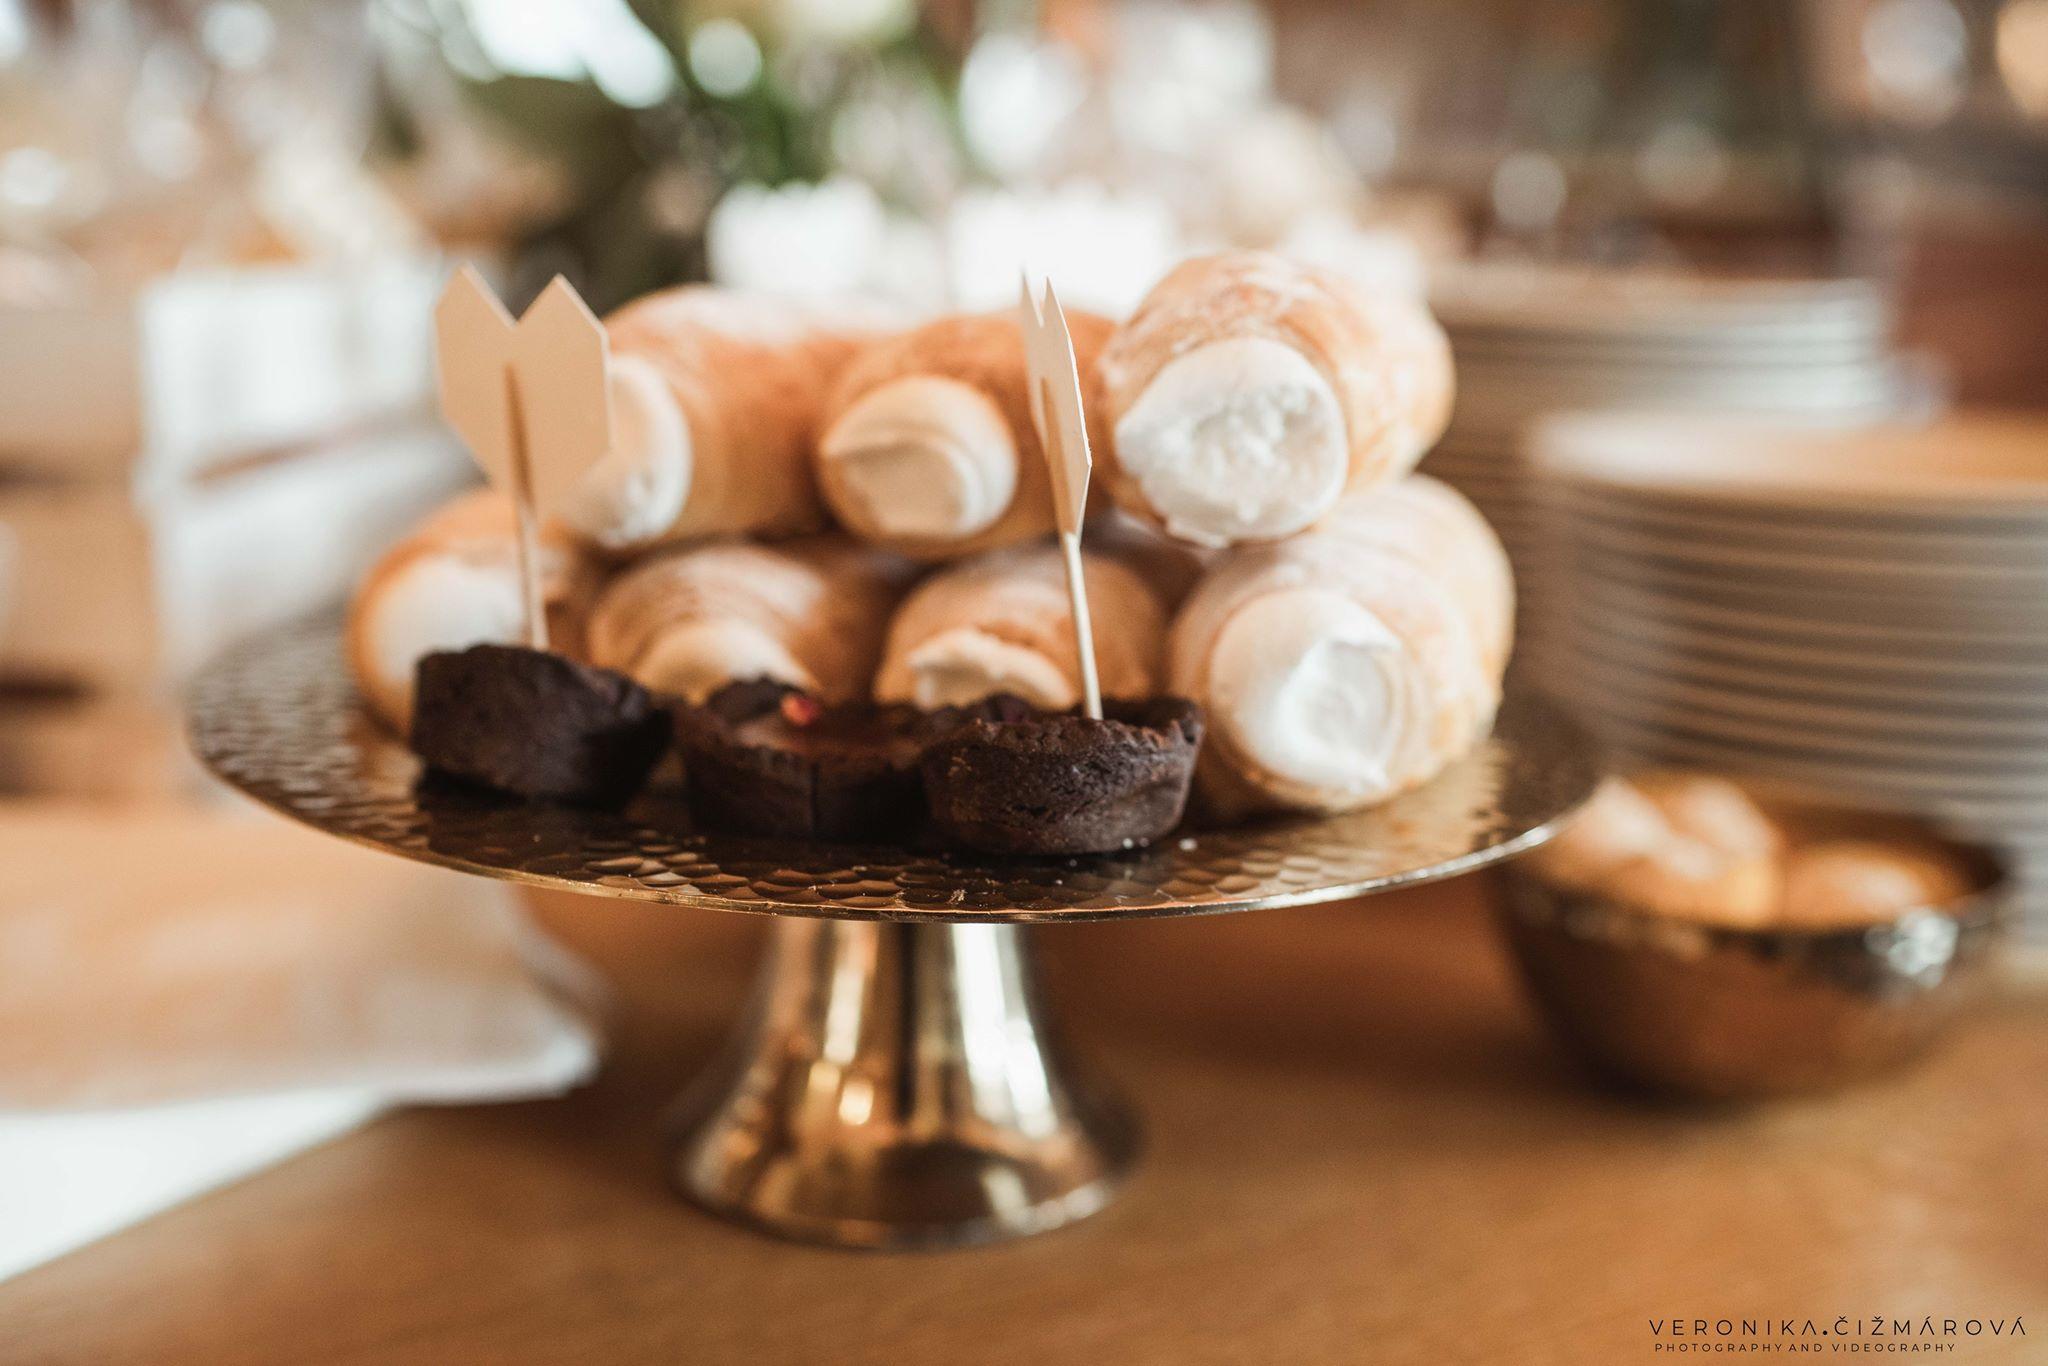 sladke-svadba-candy-barjpg